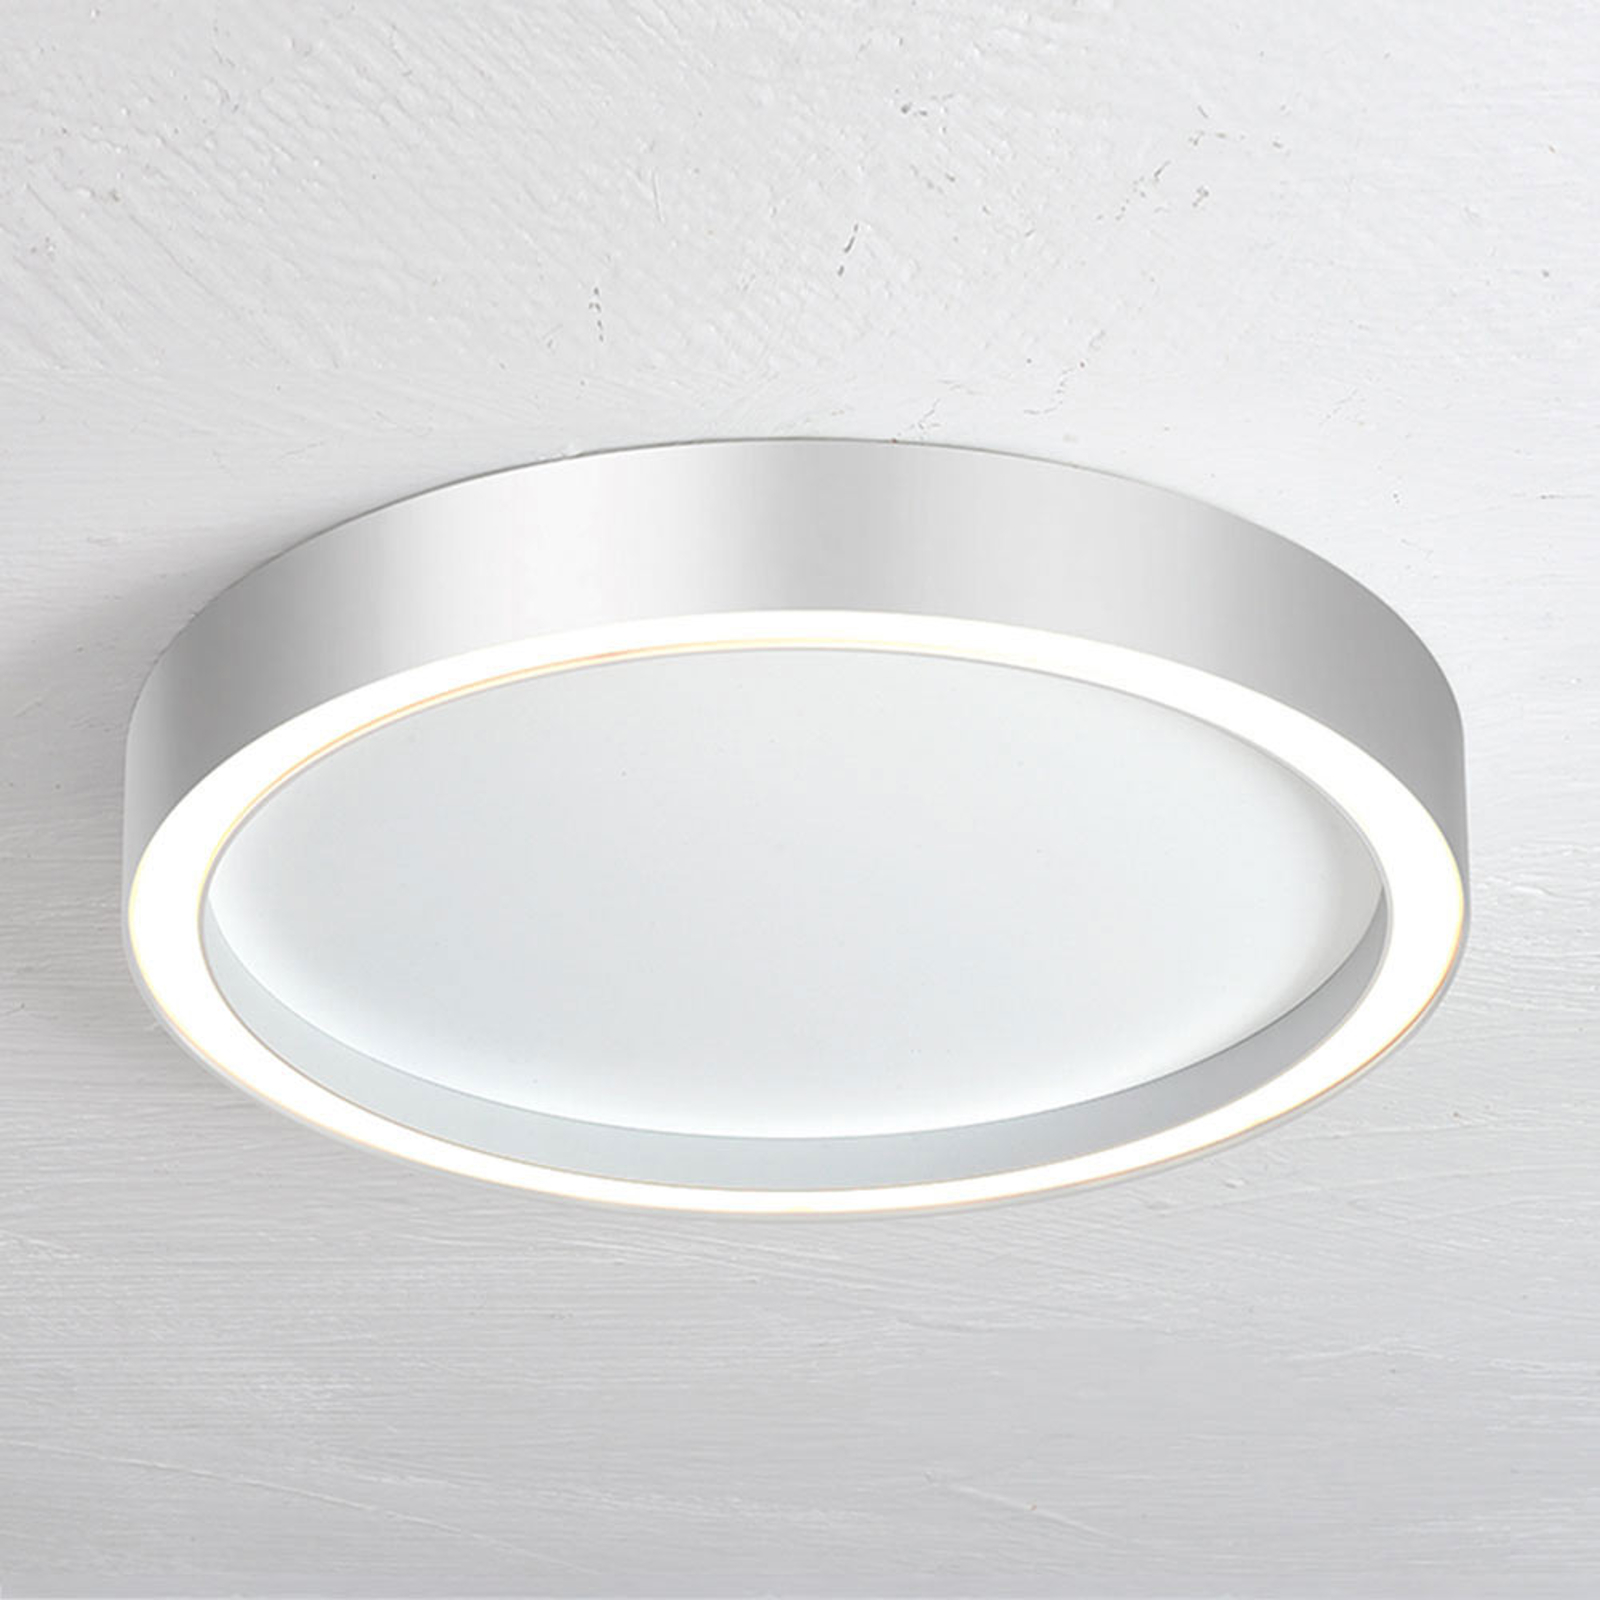 Bopp Aura plafoniera LED Ø 30 cm bianco/alluminio